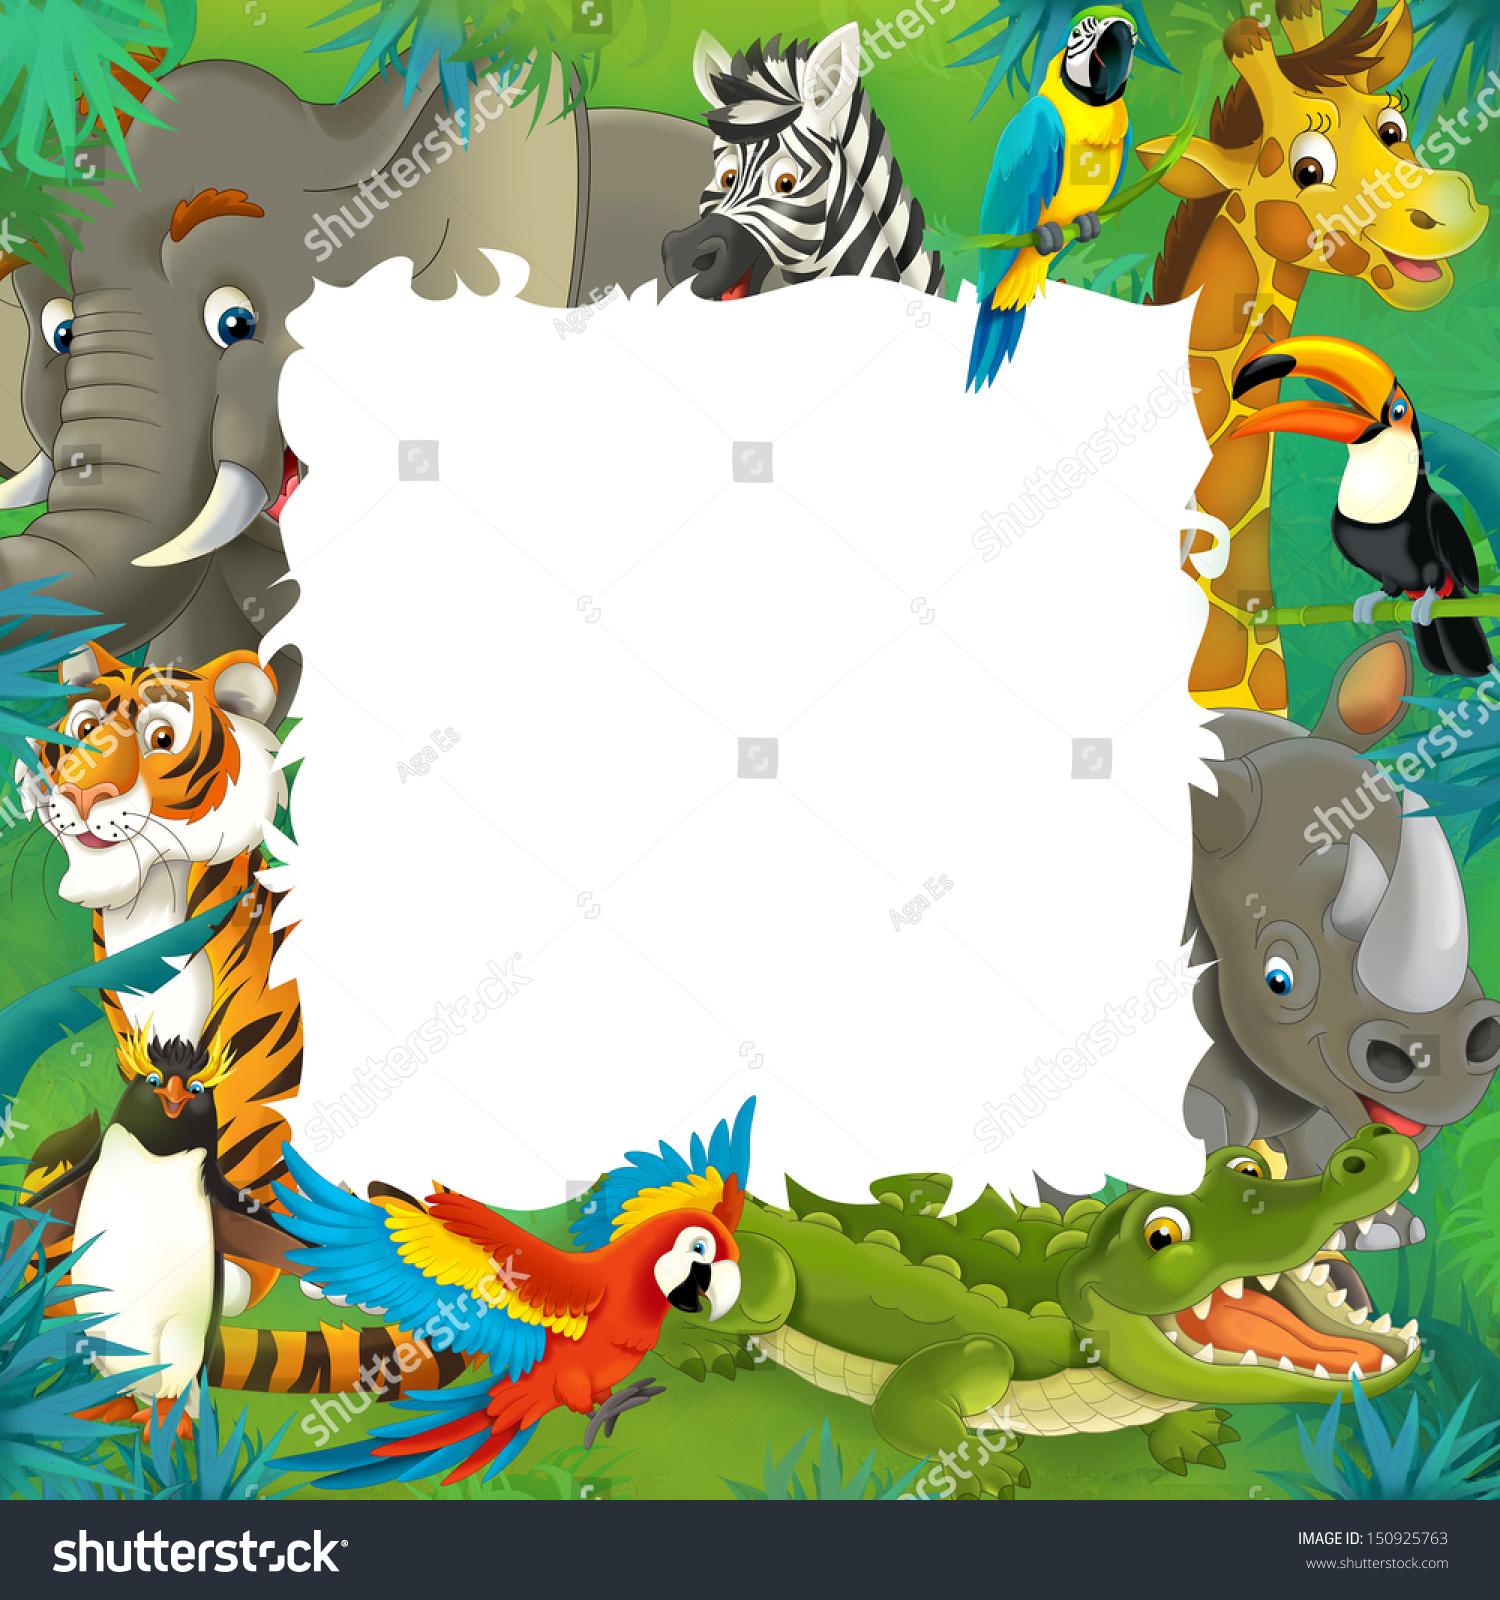 Jungle Forest Tree Animal Owl Monkey Bear Deer Wall